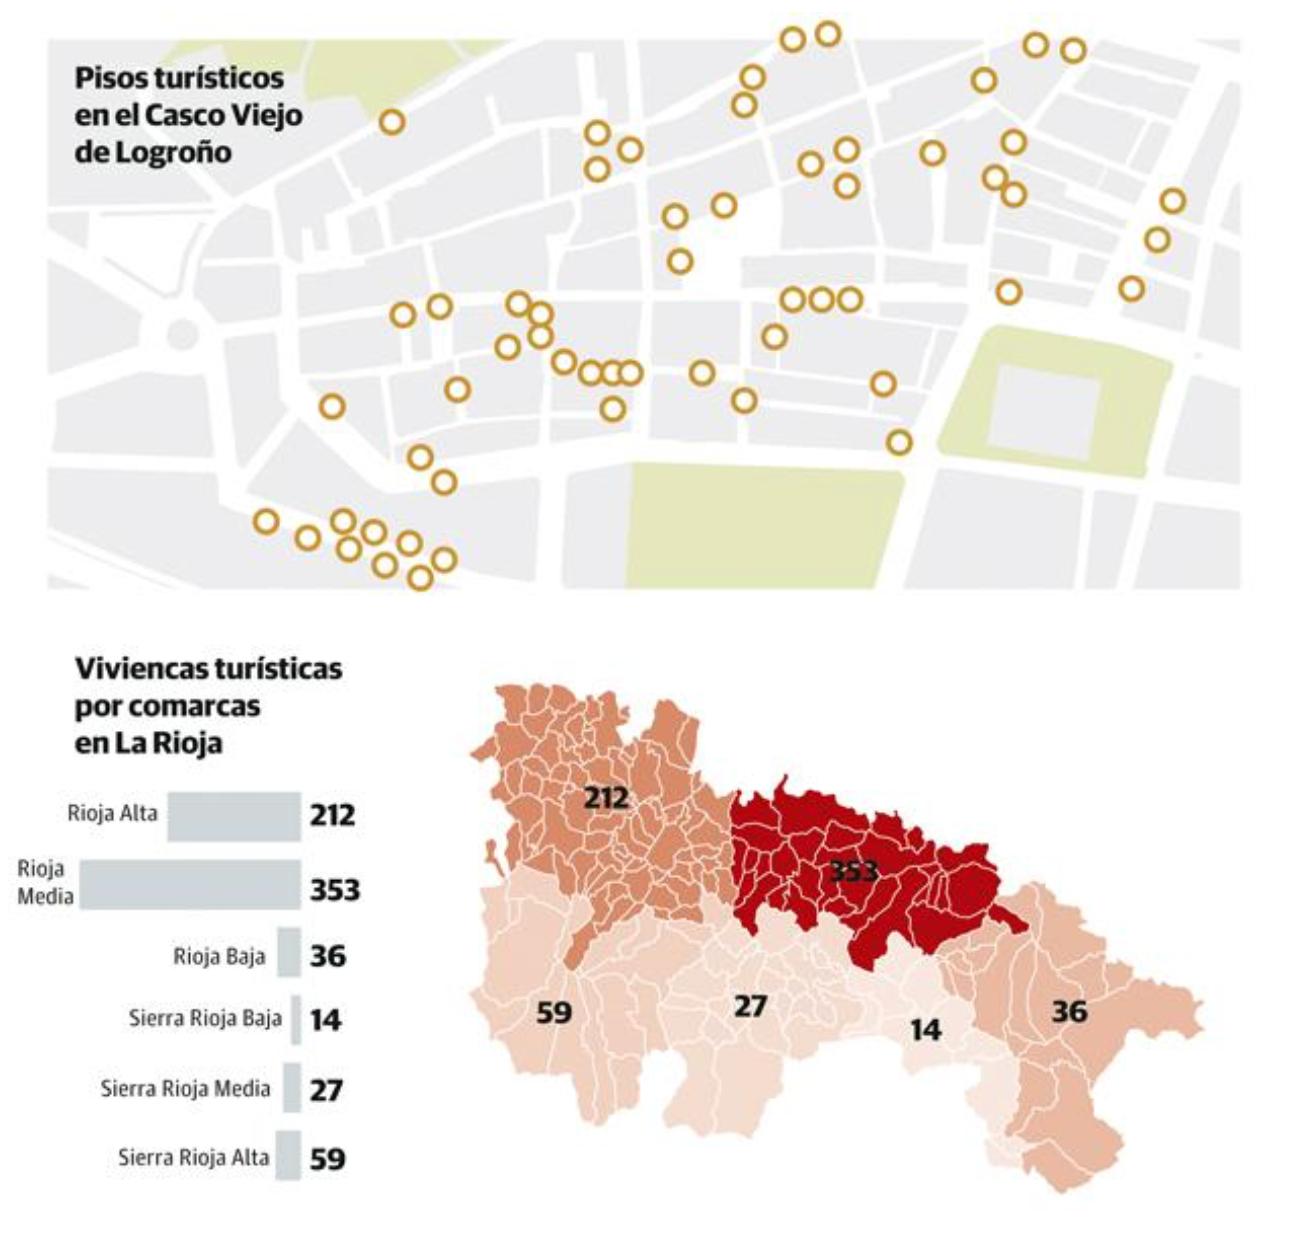 Viviendas turísticas por comarcas en La Rioja